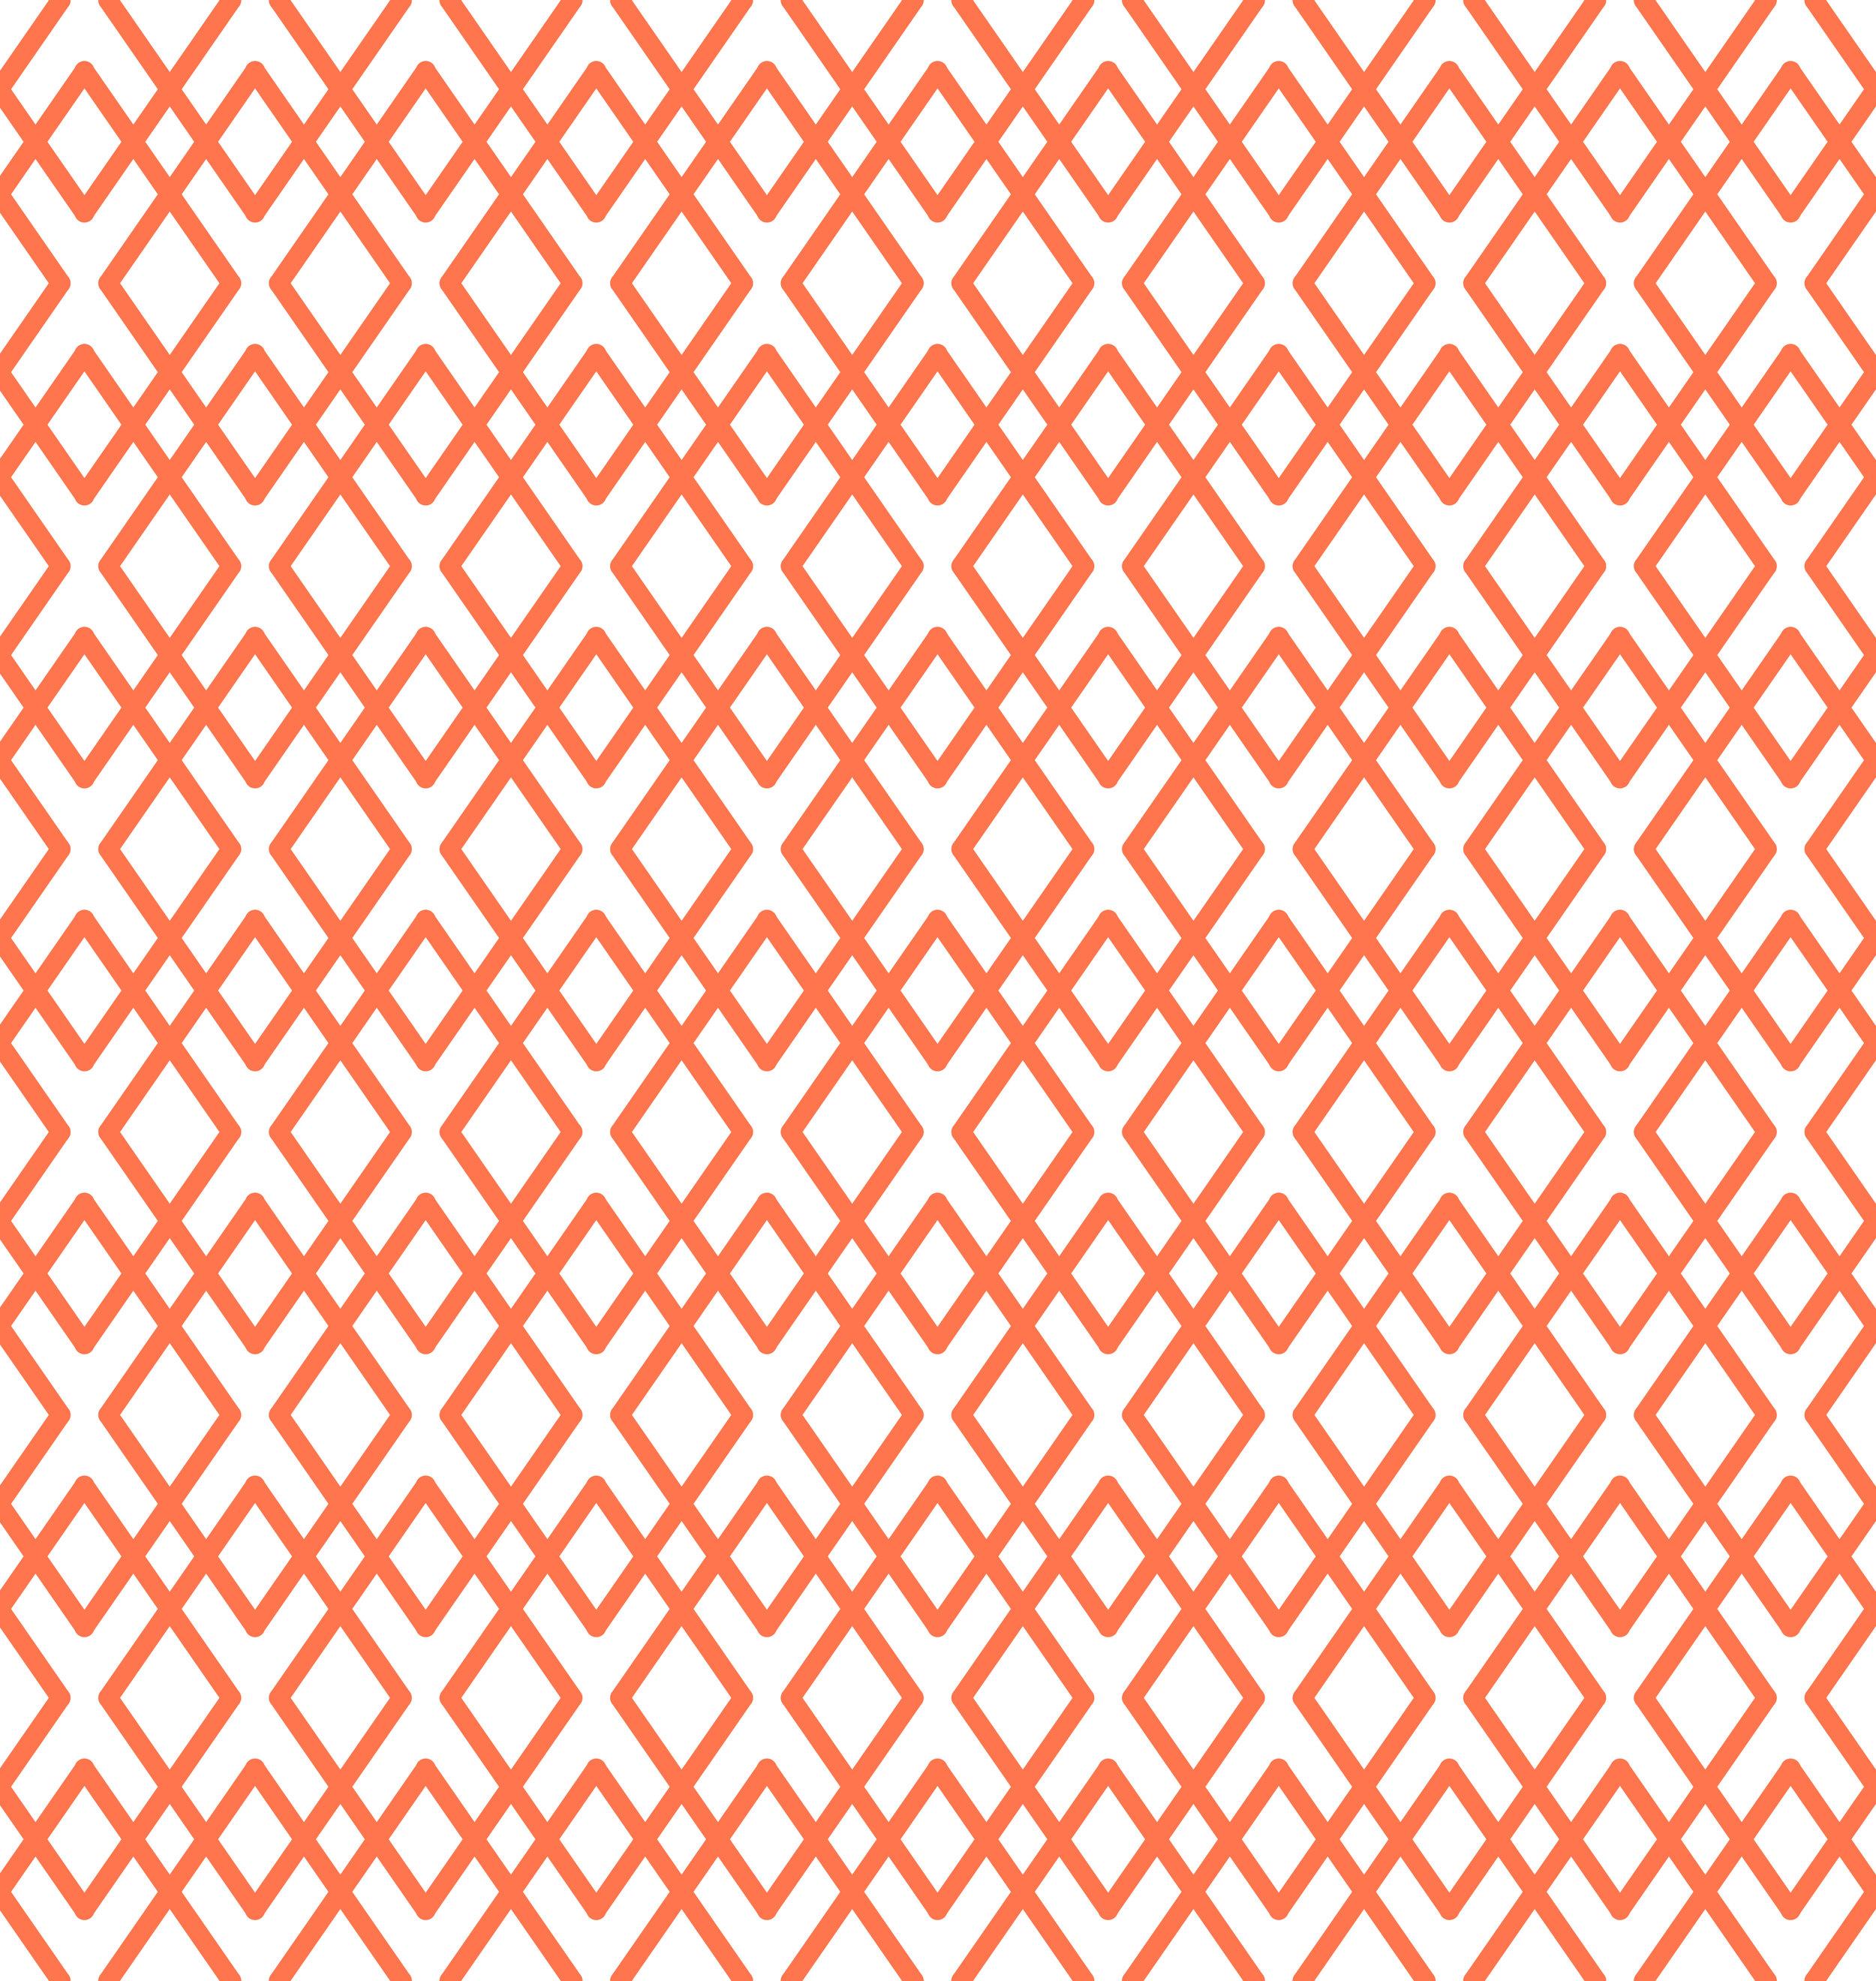 lattice white with coral-01.jpg